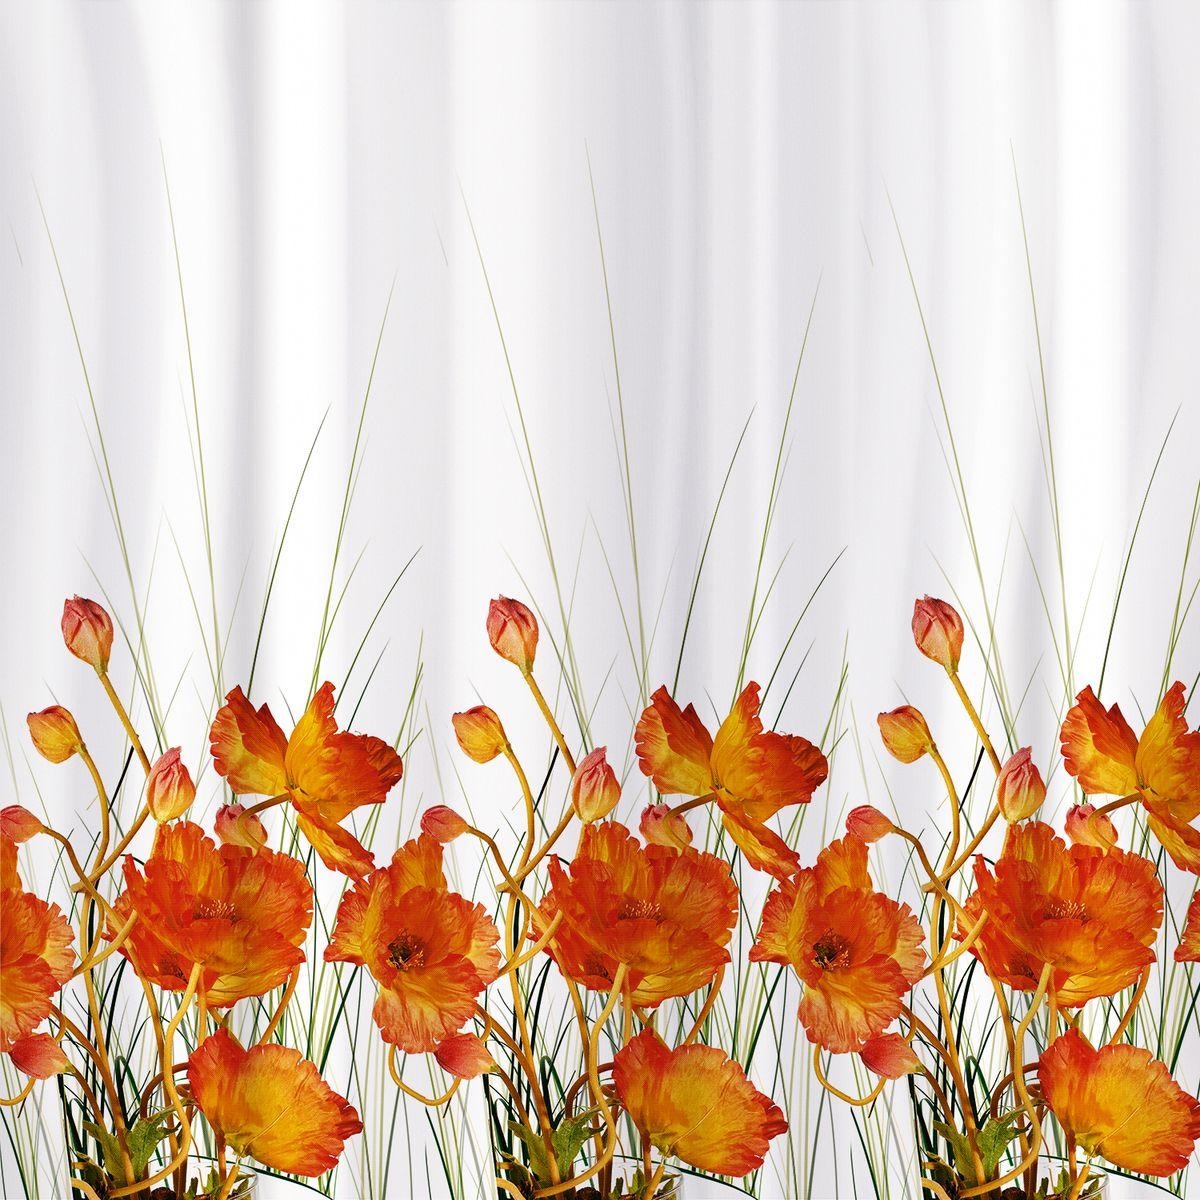 Штора для ванной Tatkraft French Poppies Textile, цвет: белый, оранжевый, 180 х 180 см крючок двойной tatkraft mega lock на вакуумном шурупе